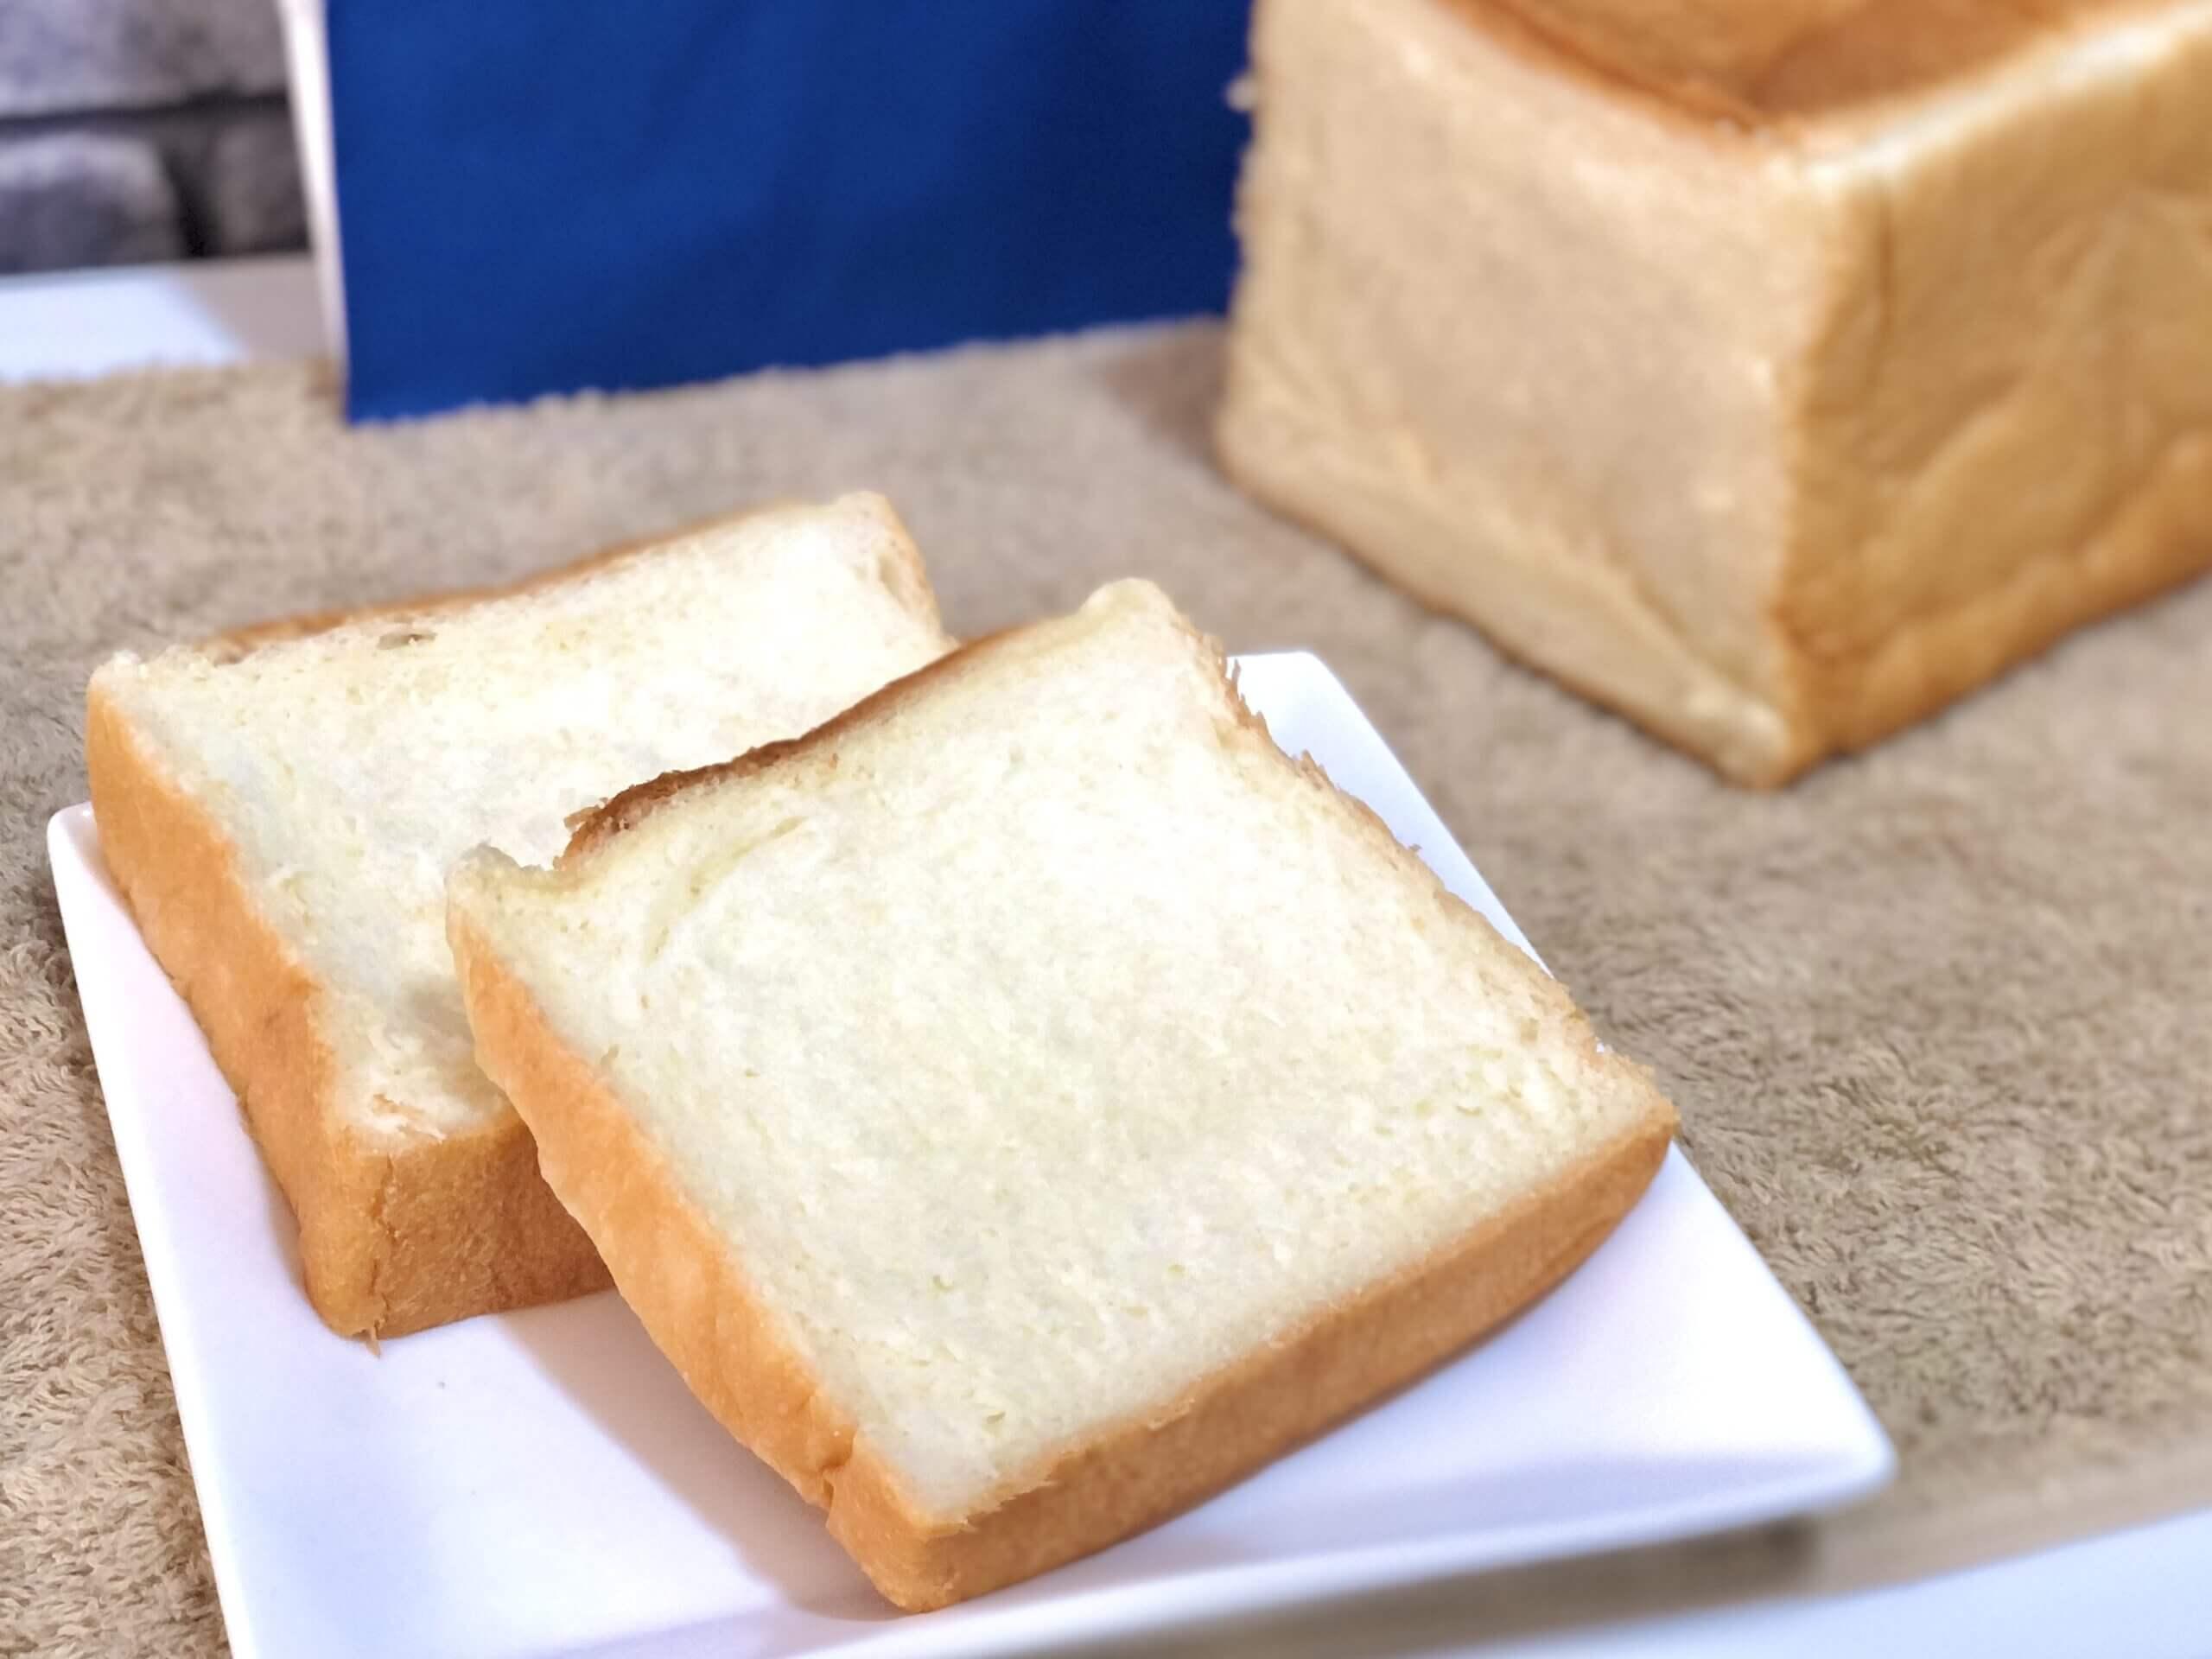 【HARE/PAN (ハレパン) 】6/2 OPEN!!和食職人監修の焼き立て純生食パン《熊本市南区田迎》